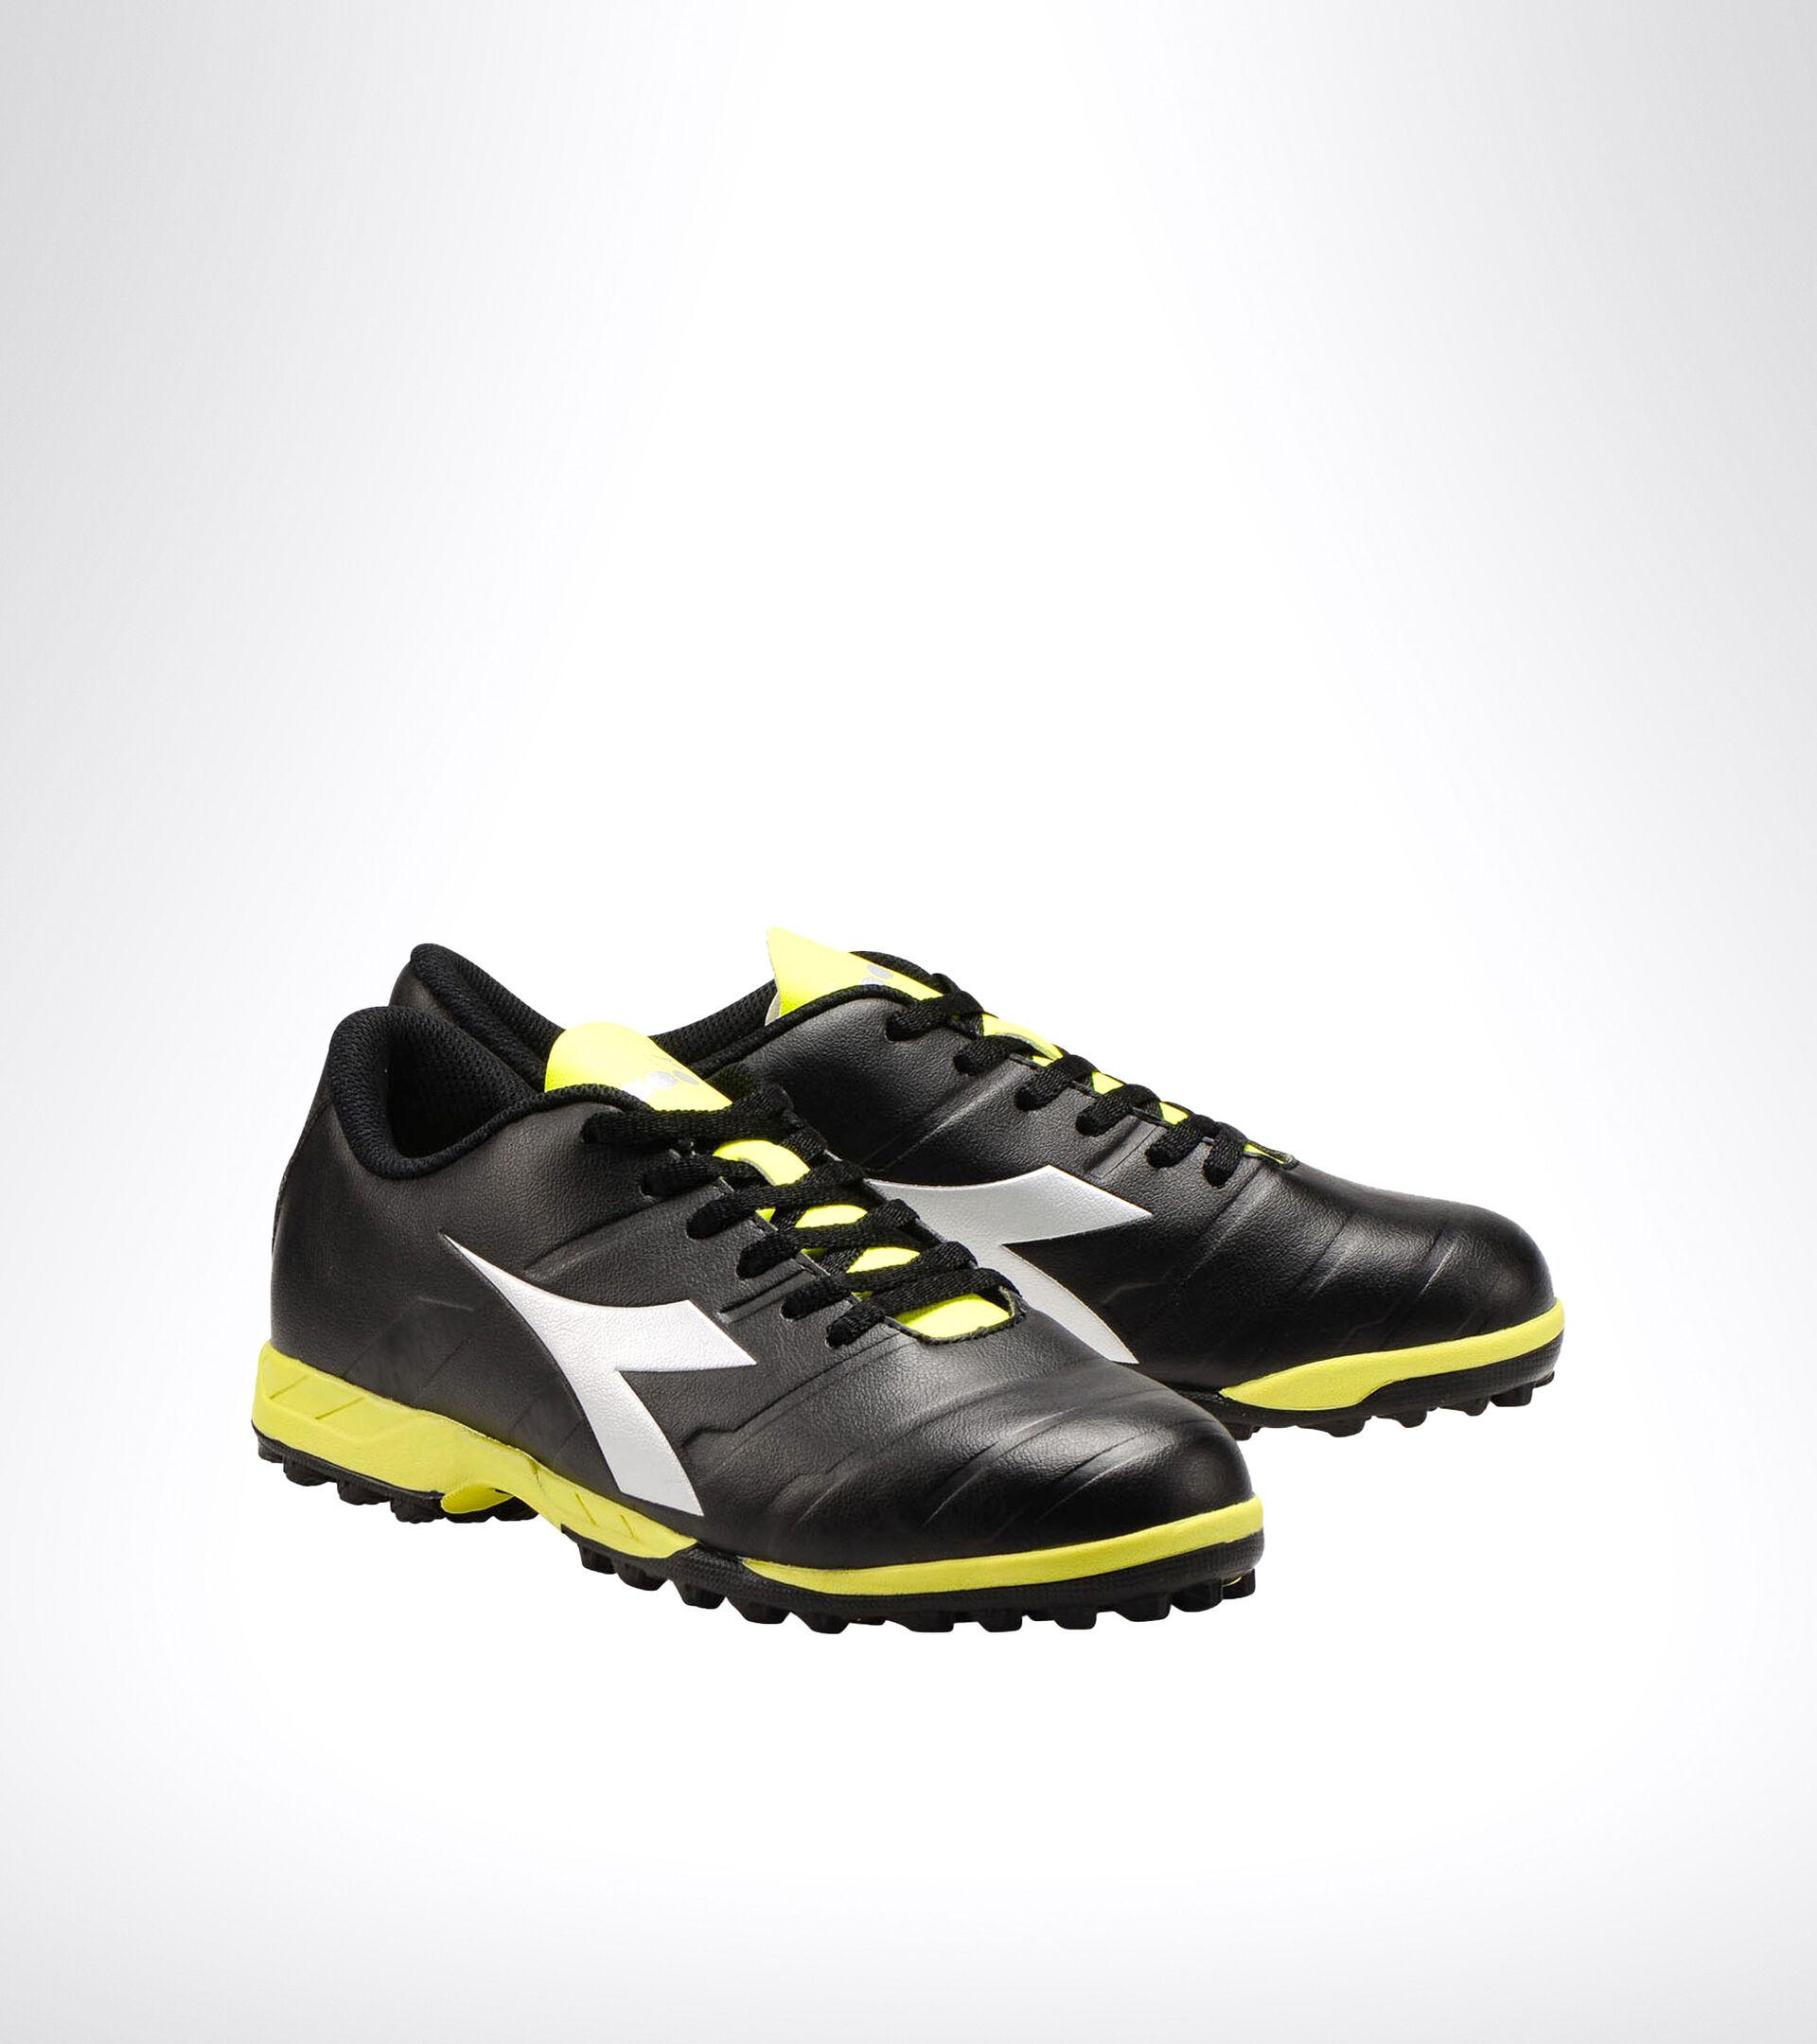 Hard ground and artificial turf football boot PICHICHI 3 TF BLACK/YELLOW FL DD/SILVER - Diadora